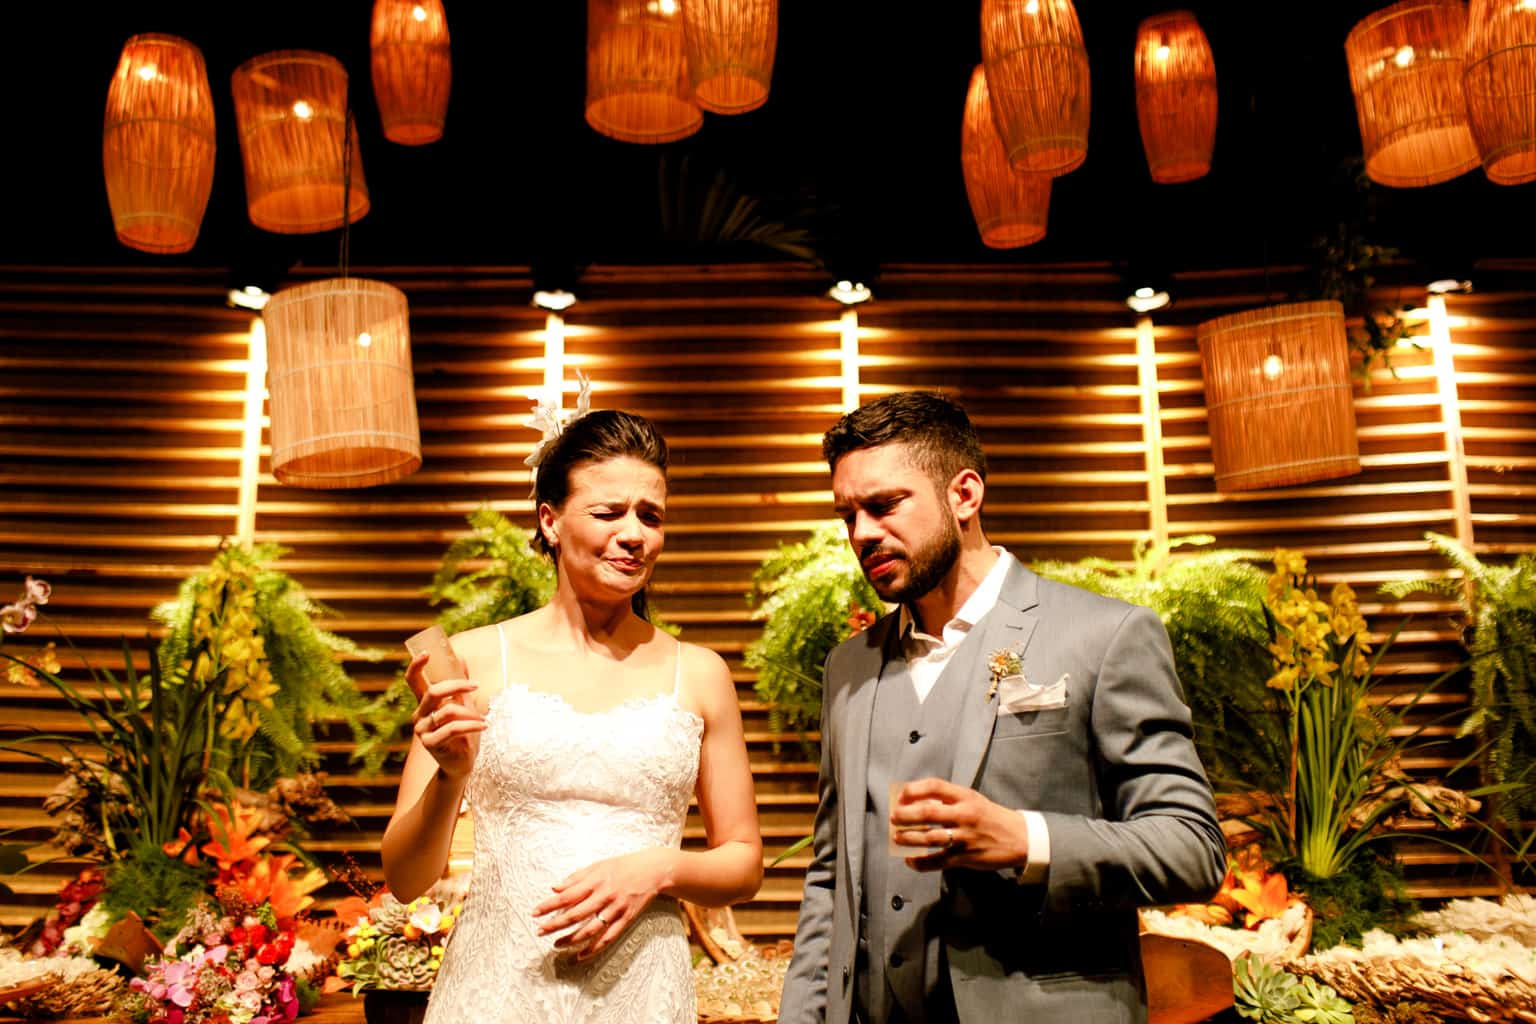 Casamento-Emanuelle-e-Alysson-Fotografia-Tadeu-Nanó-e-Luca-Antunes145